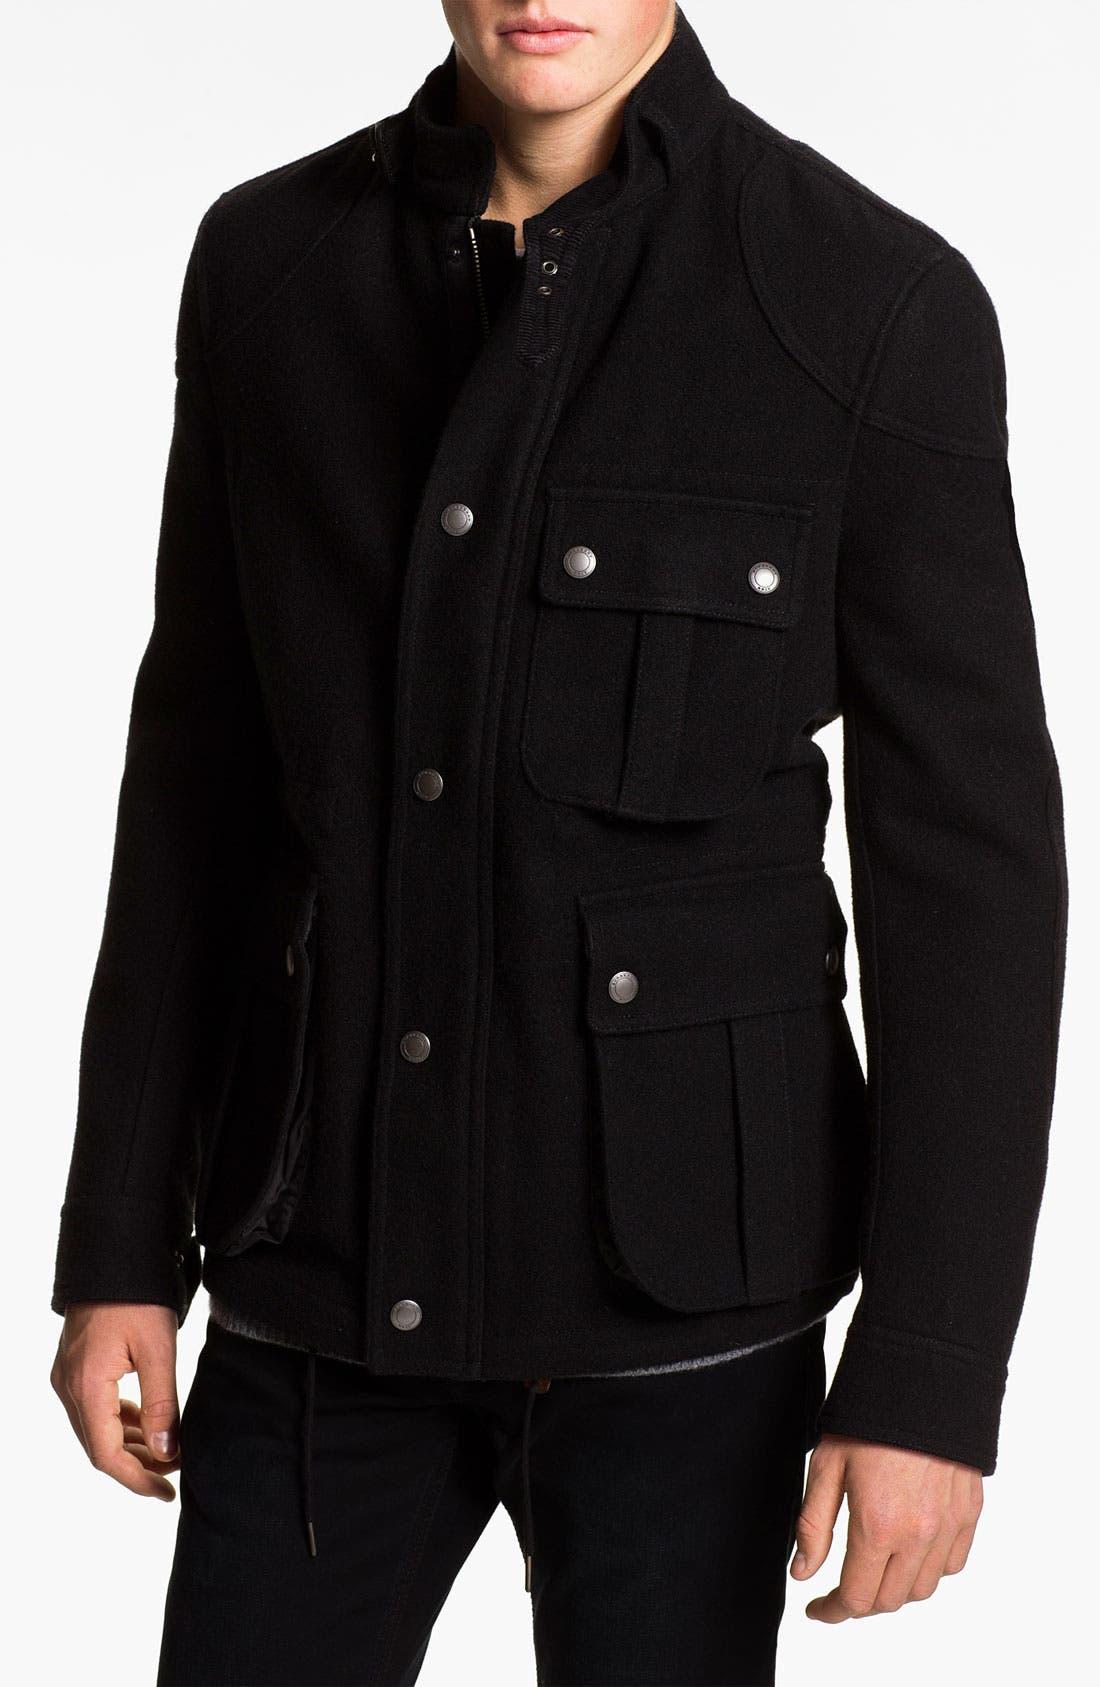 Alternate Image 1 Selected - Burberry Brit Wool Blend Field Jacket